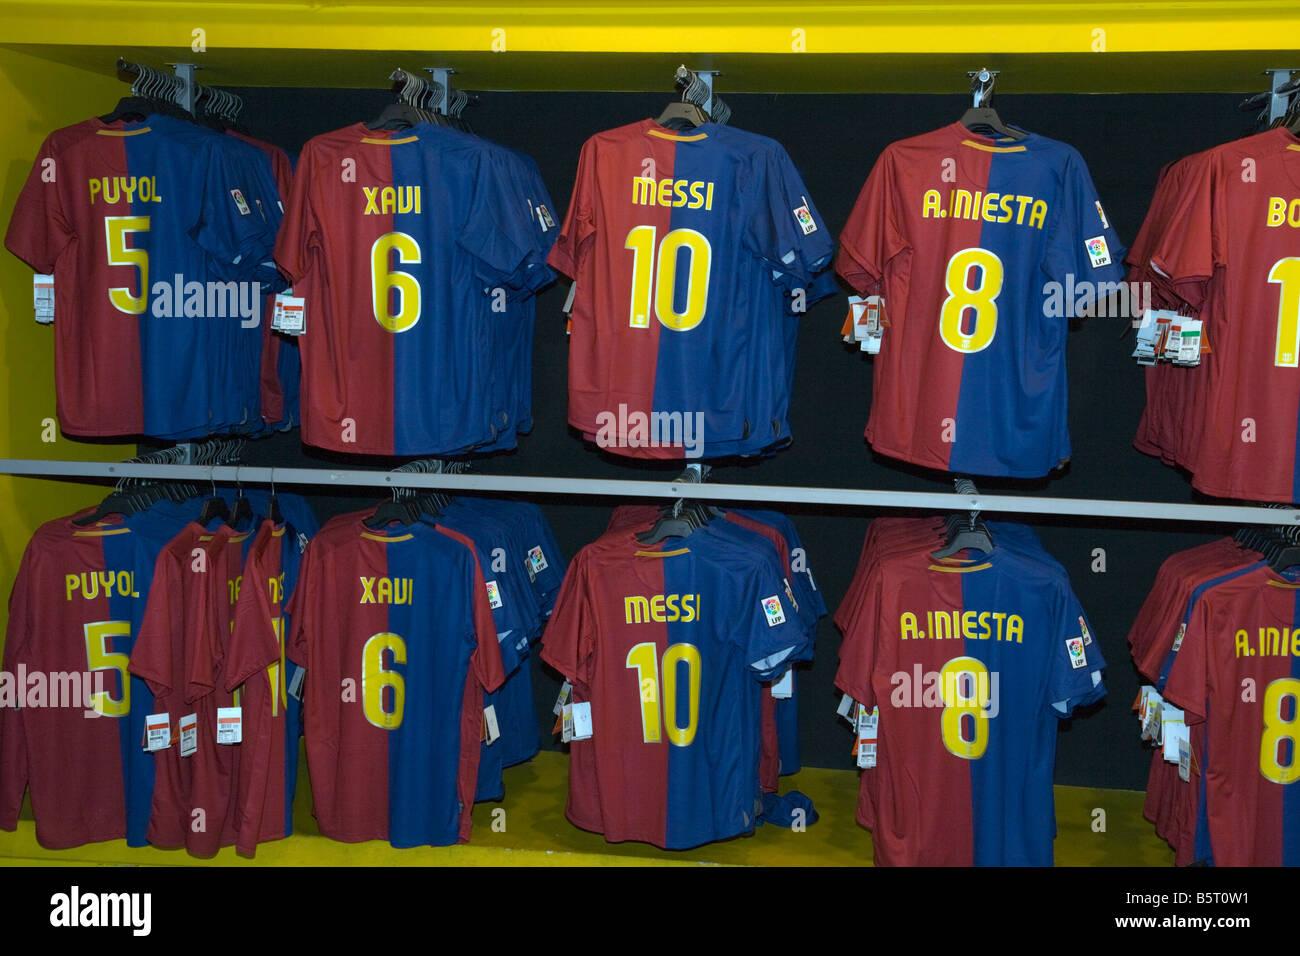 Fc barcelona team shop coupons